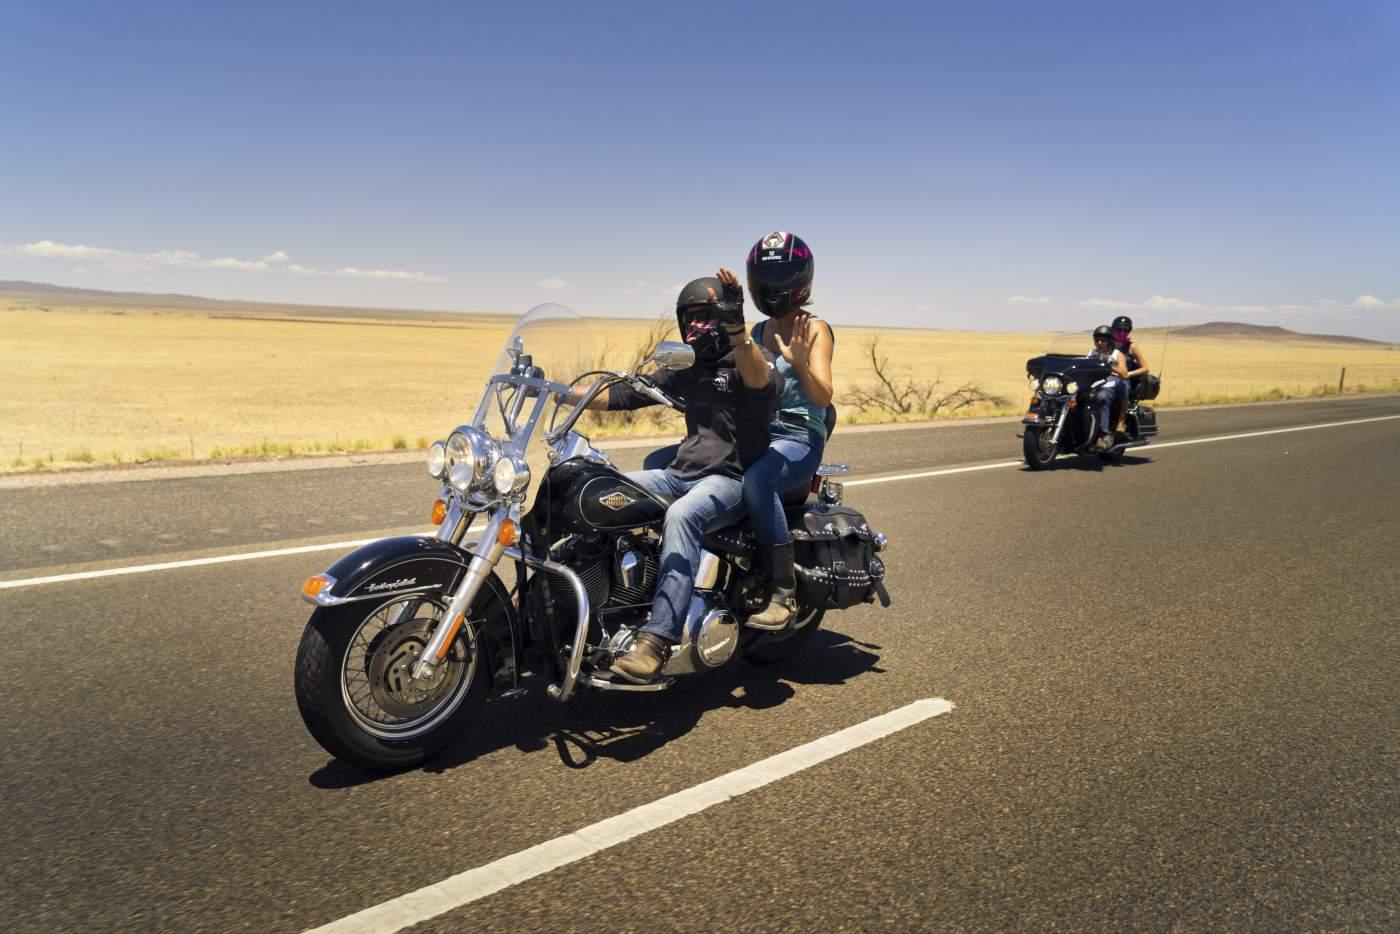 overcross usa motorradreise route 66 durch amerika. Black Bedroom Furniture Sets. Home Design Ideas